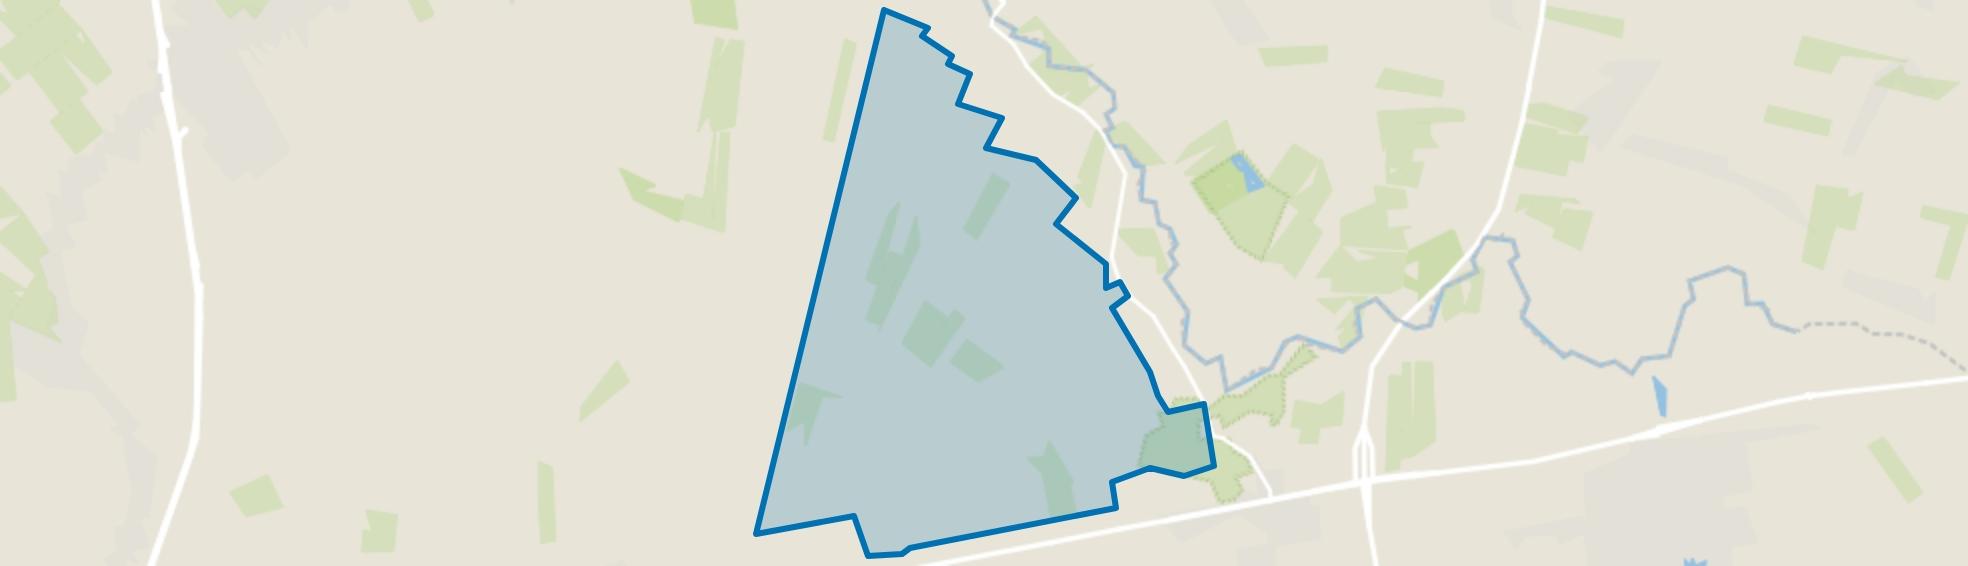 Verspreide huizen Westerhuizingerveld, Balkbrug map